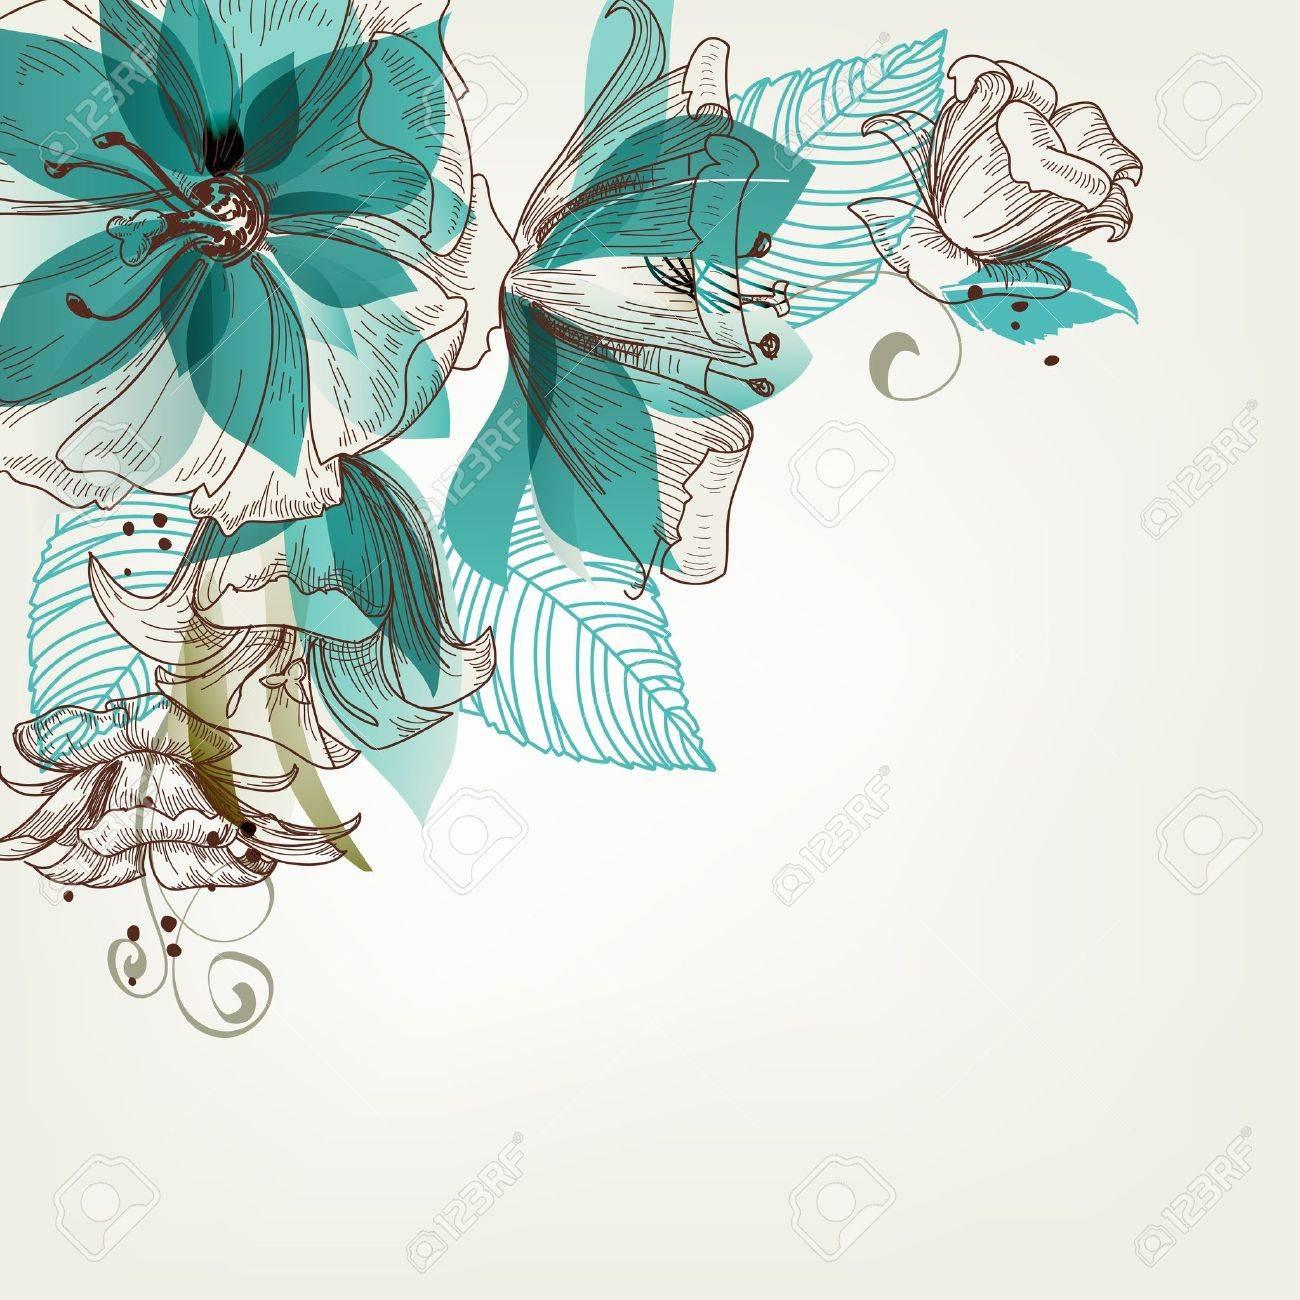 Retro flowers illustration - 15437107